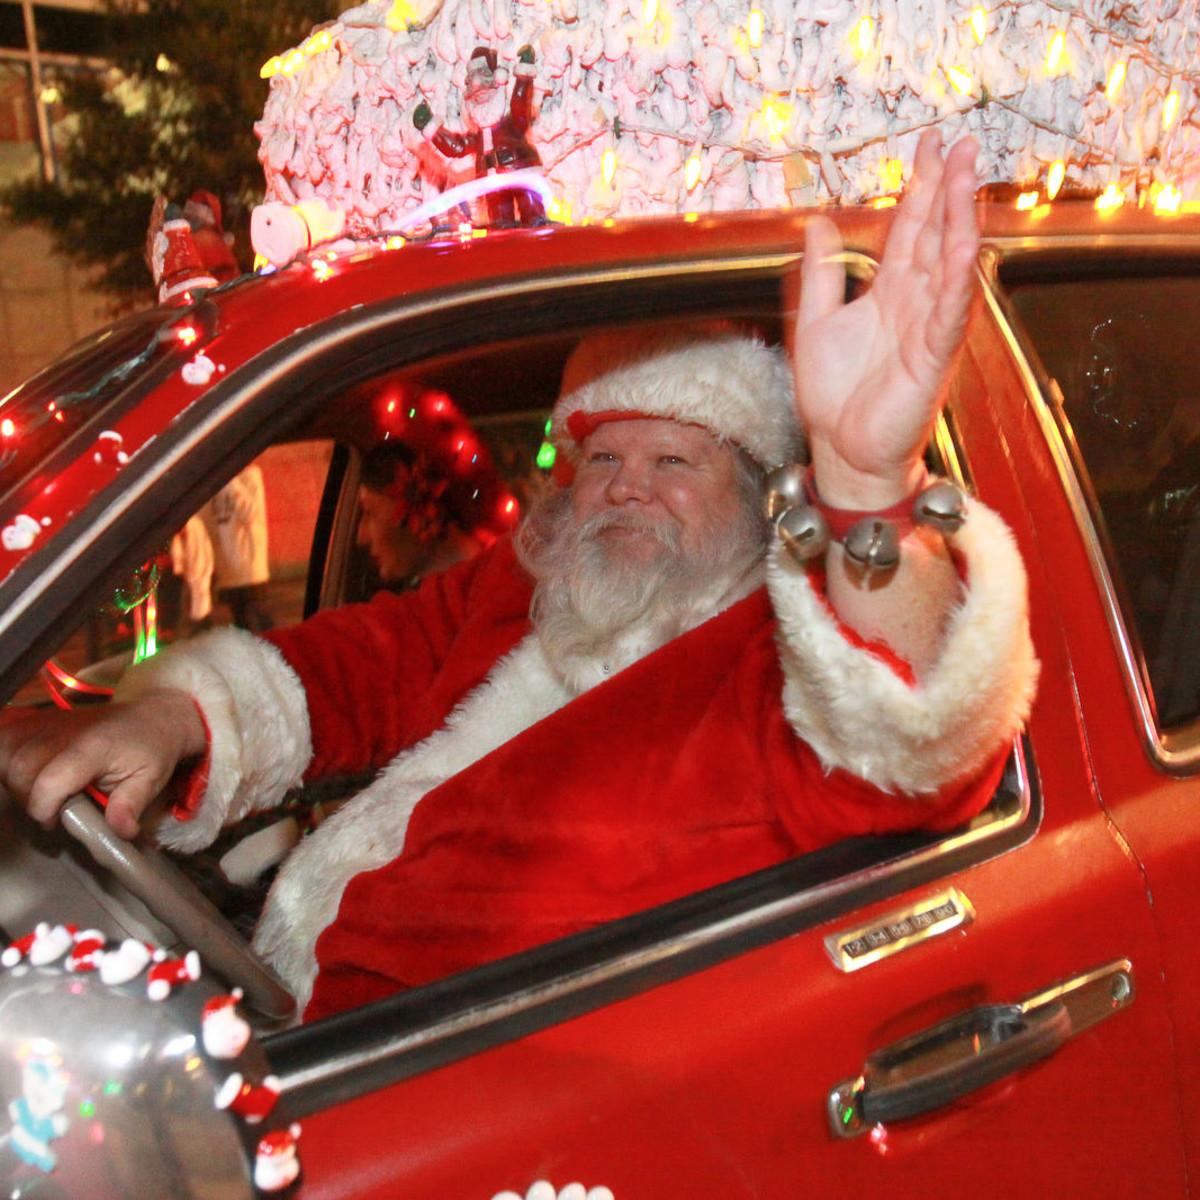 News_Gloworama 2009_Santa Claus